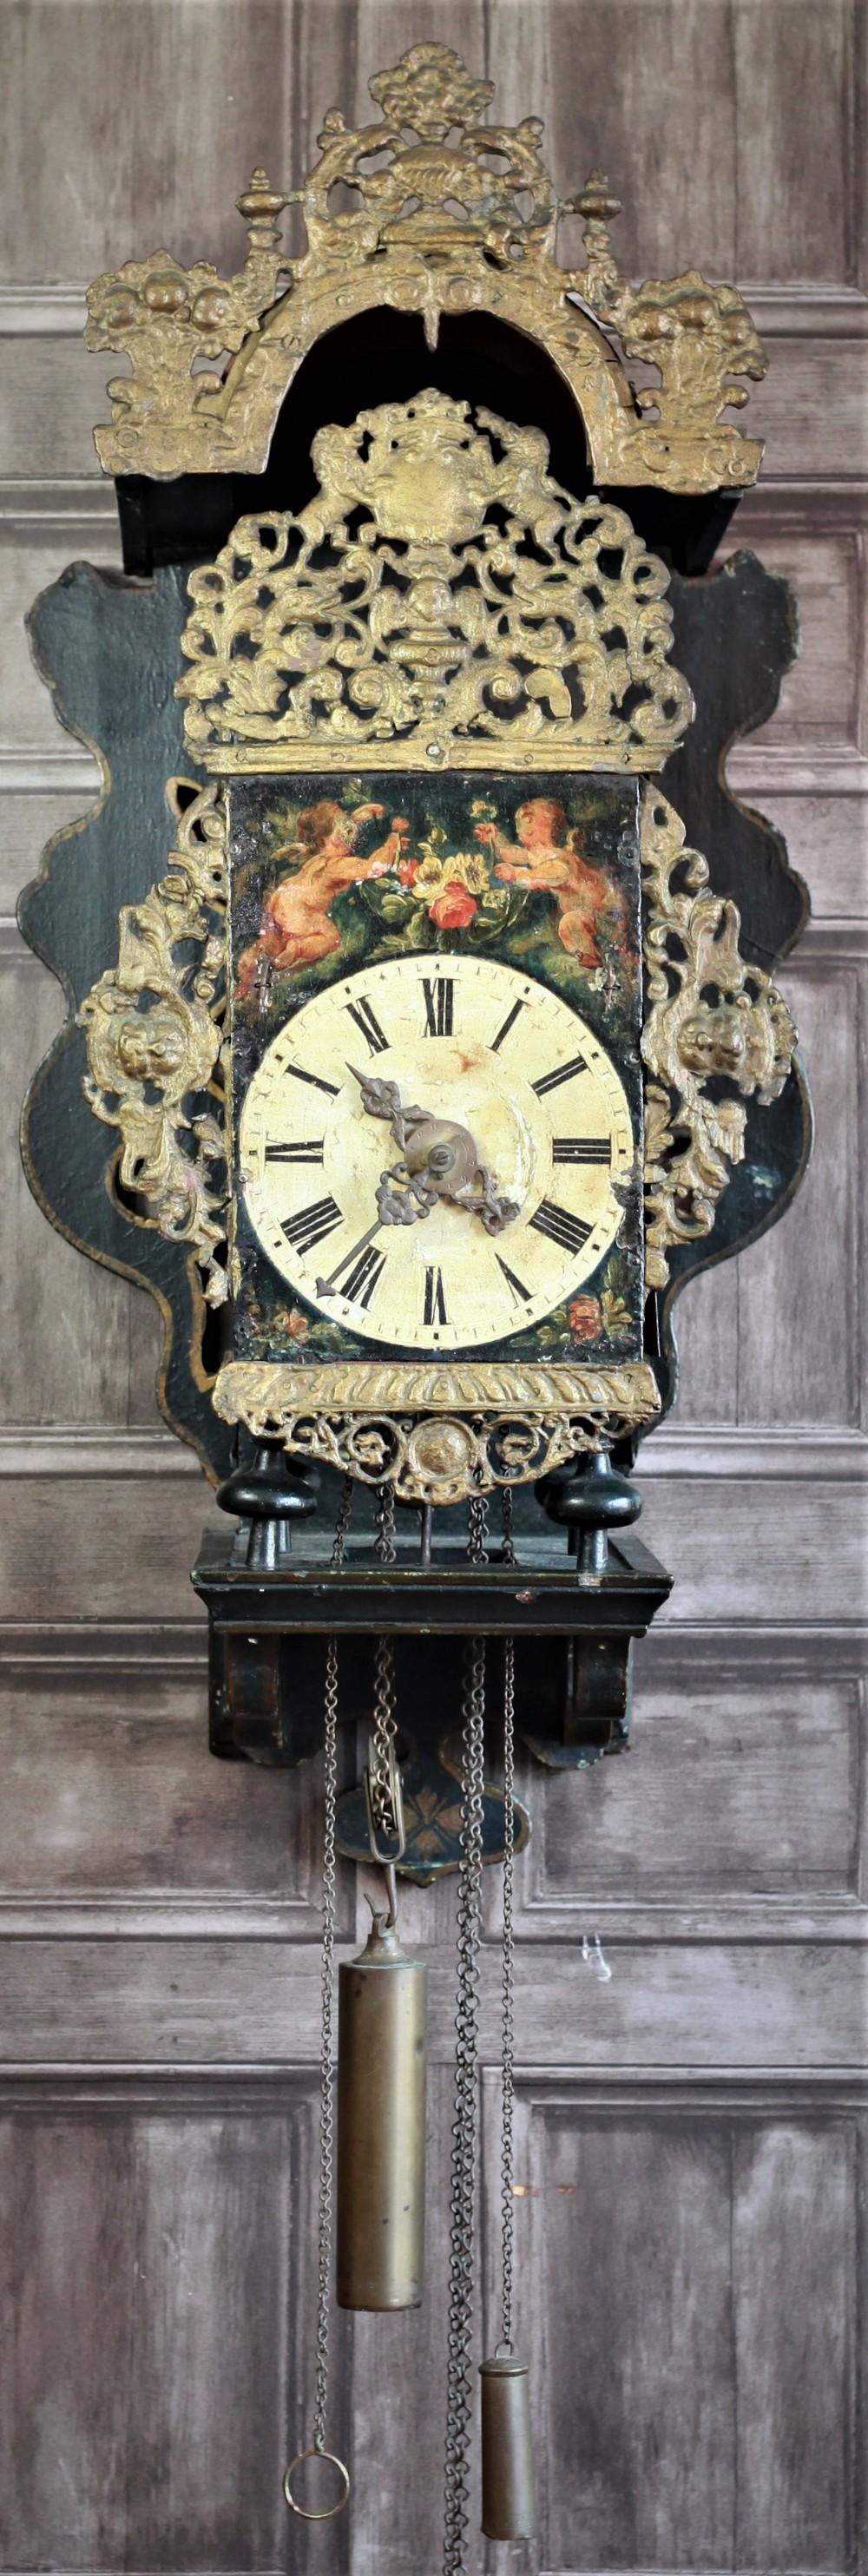 18th century dutch stoelklok in a most wonderful original condition